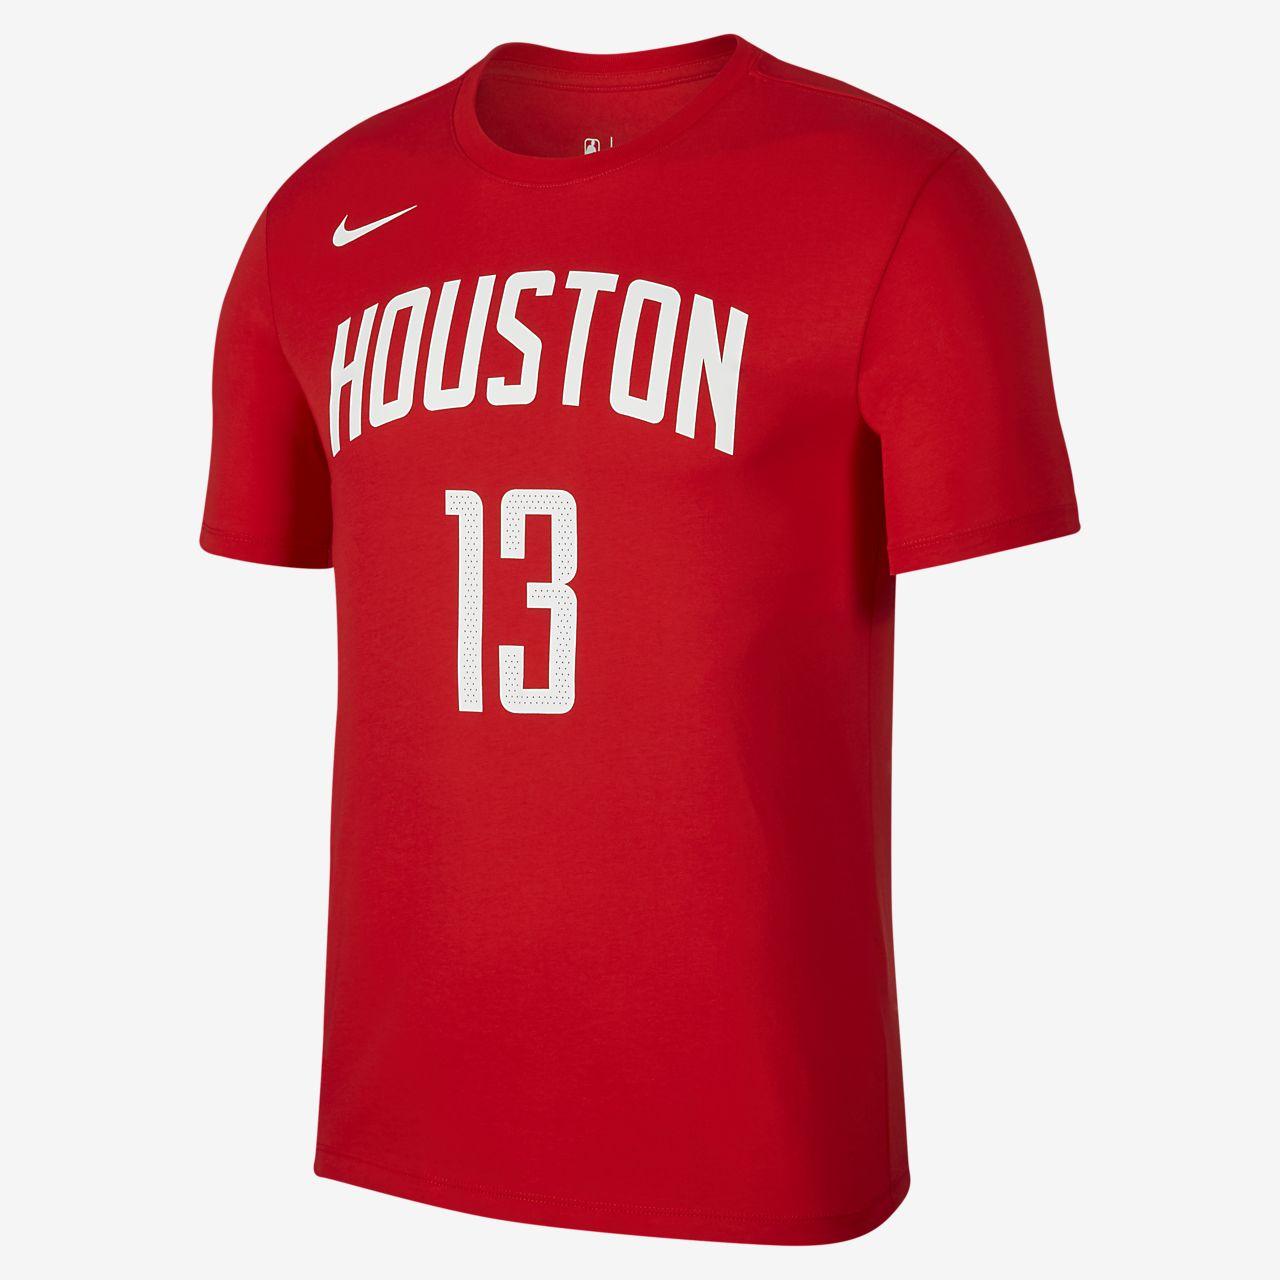 3f6f51b8075 James Harden Houston Rockets City Edition Nike Dri-FIT Men's NBA T ...